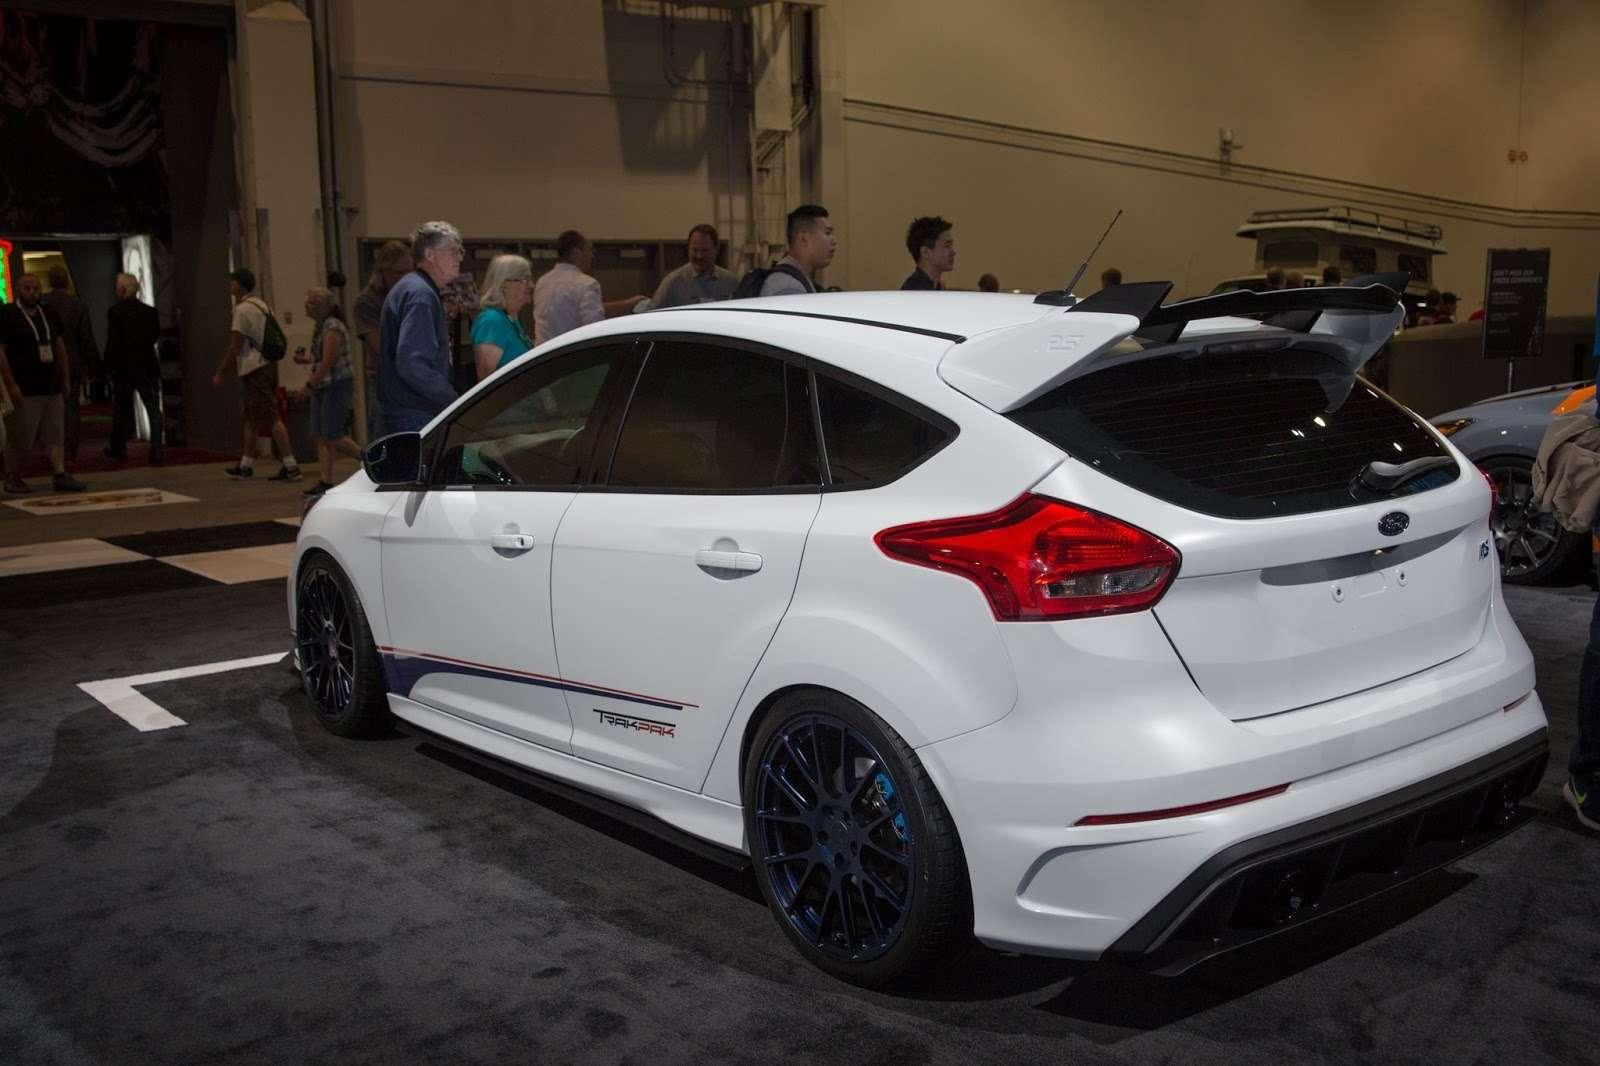 Молния старины Джека: Ford Focus RSначнет охоту насуперкары